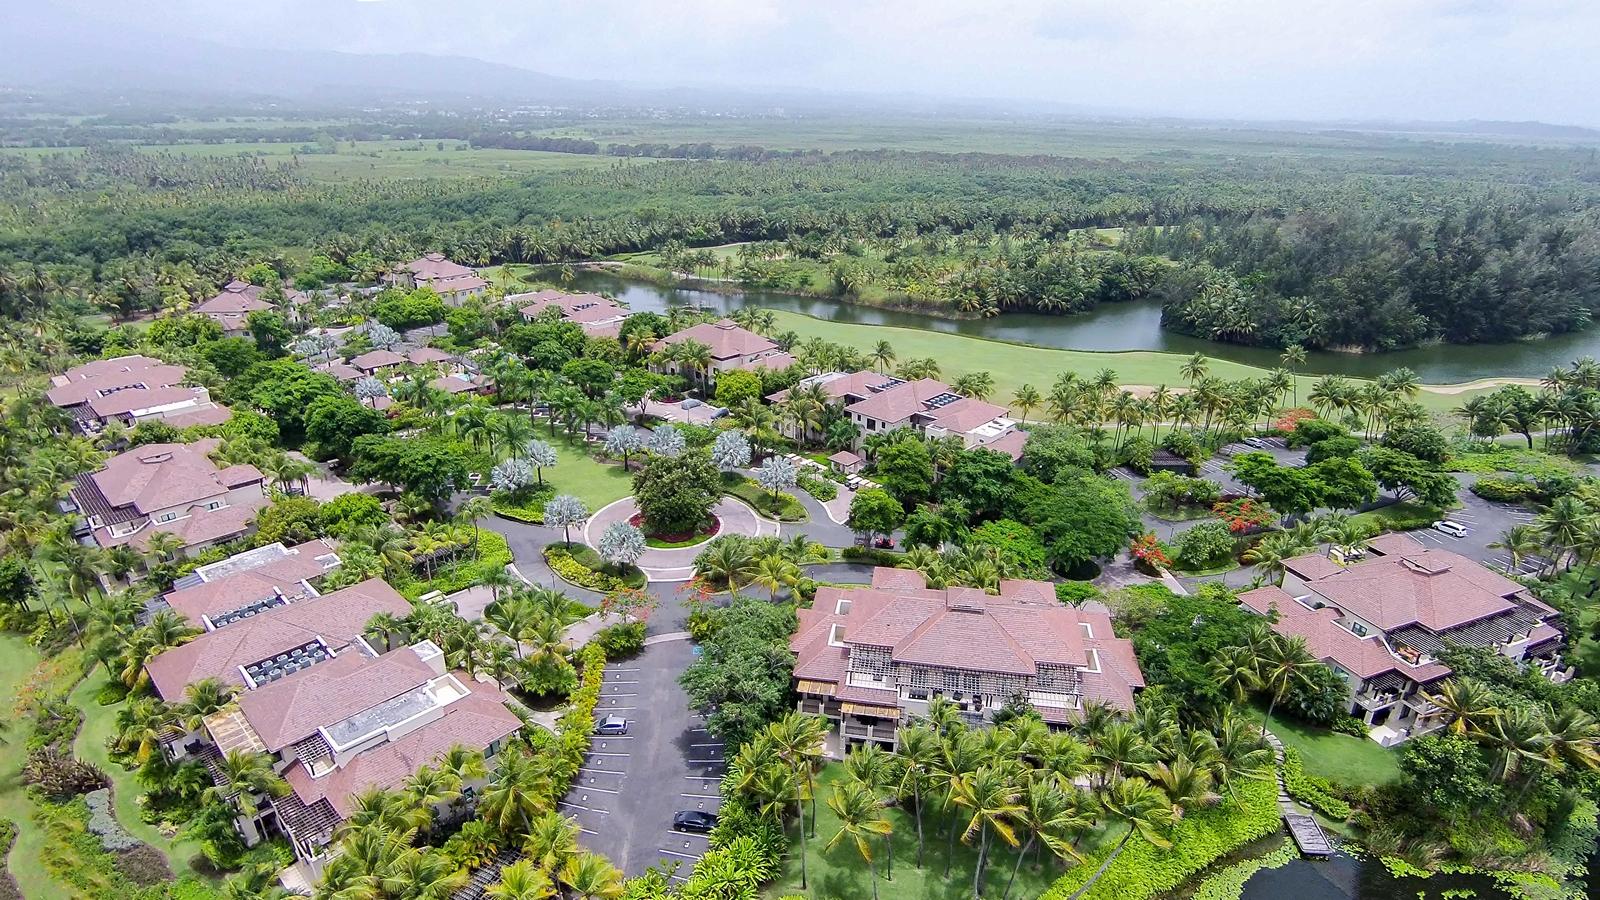 Additional photo for property listing at Lakefront with Golf Views Villa State Rd. 187, Km. 4.2 Las Verandas Apt 1206 Rio Grande, Puerto Rico 00745 Porto Rico